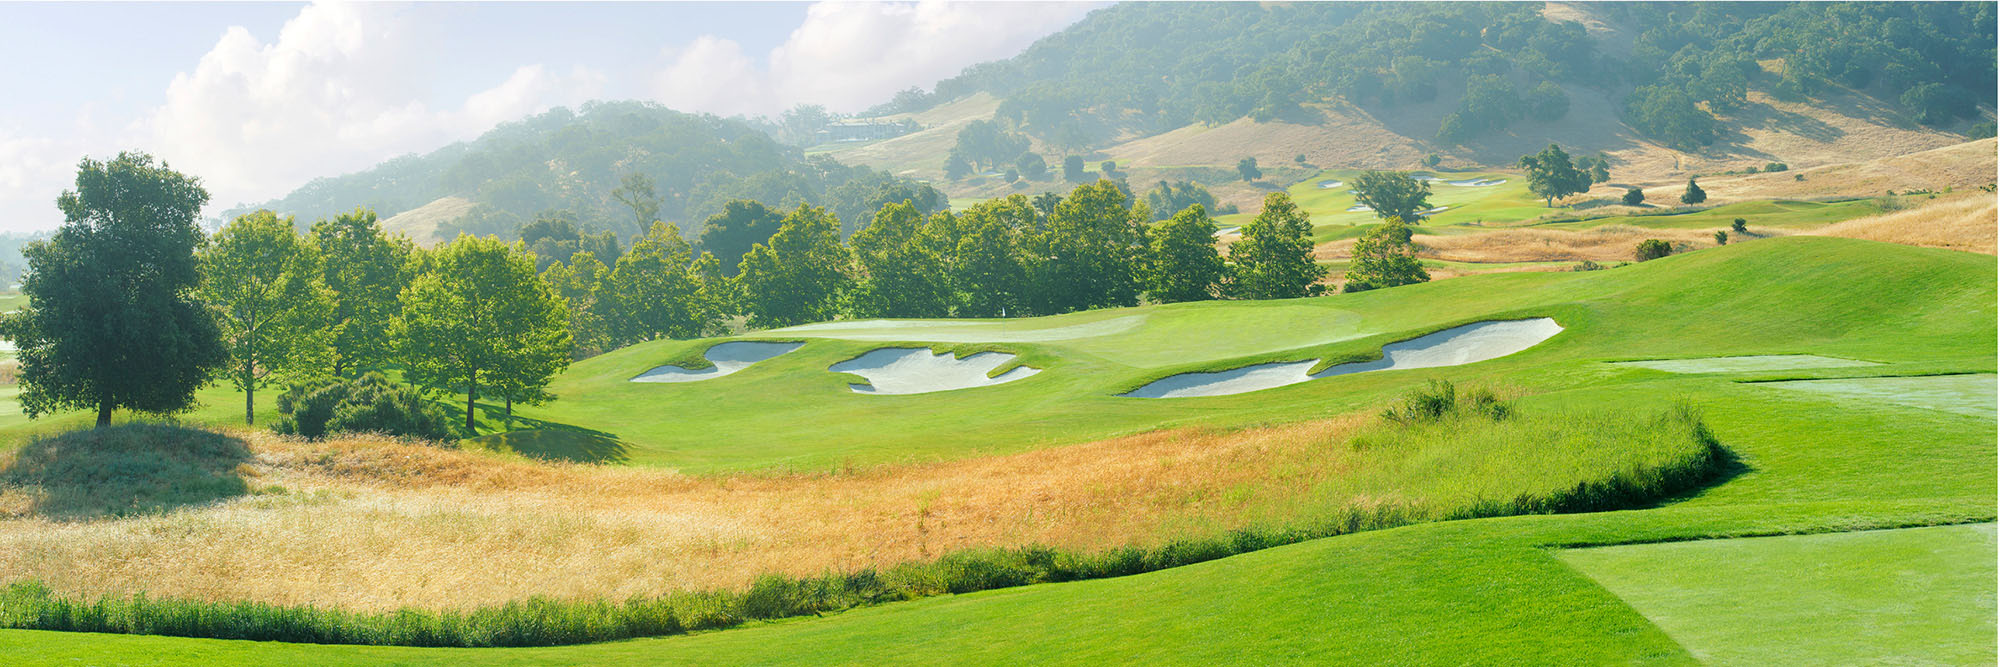 Golf Course Image - CordeValle Golf Club No. 12